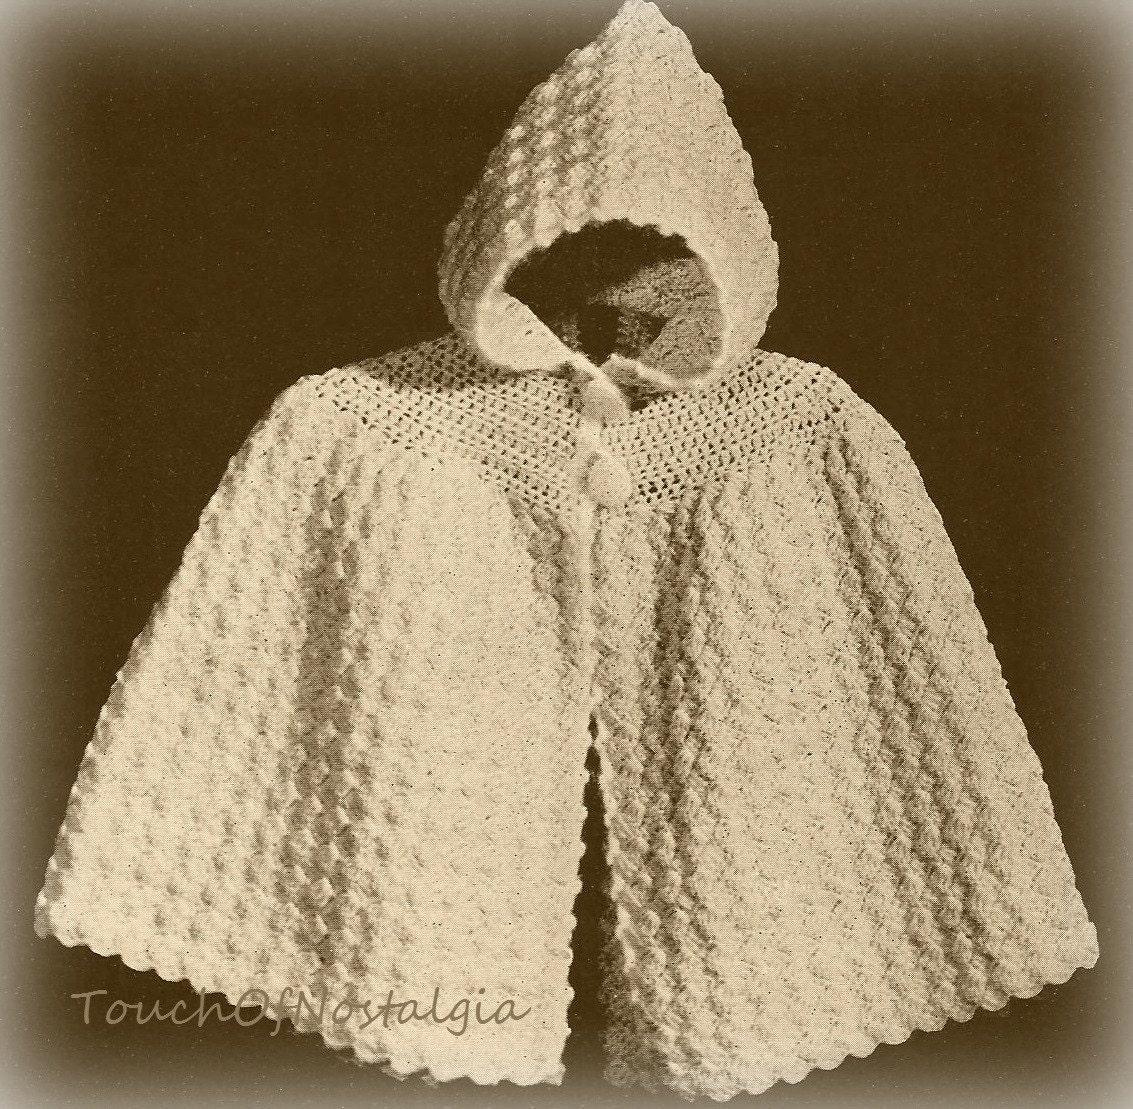 Free Vintage Crochet Cape Patterns : Crochet Baby HOODED CAPE vintage Crochet by touchofnostalgia7